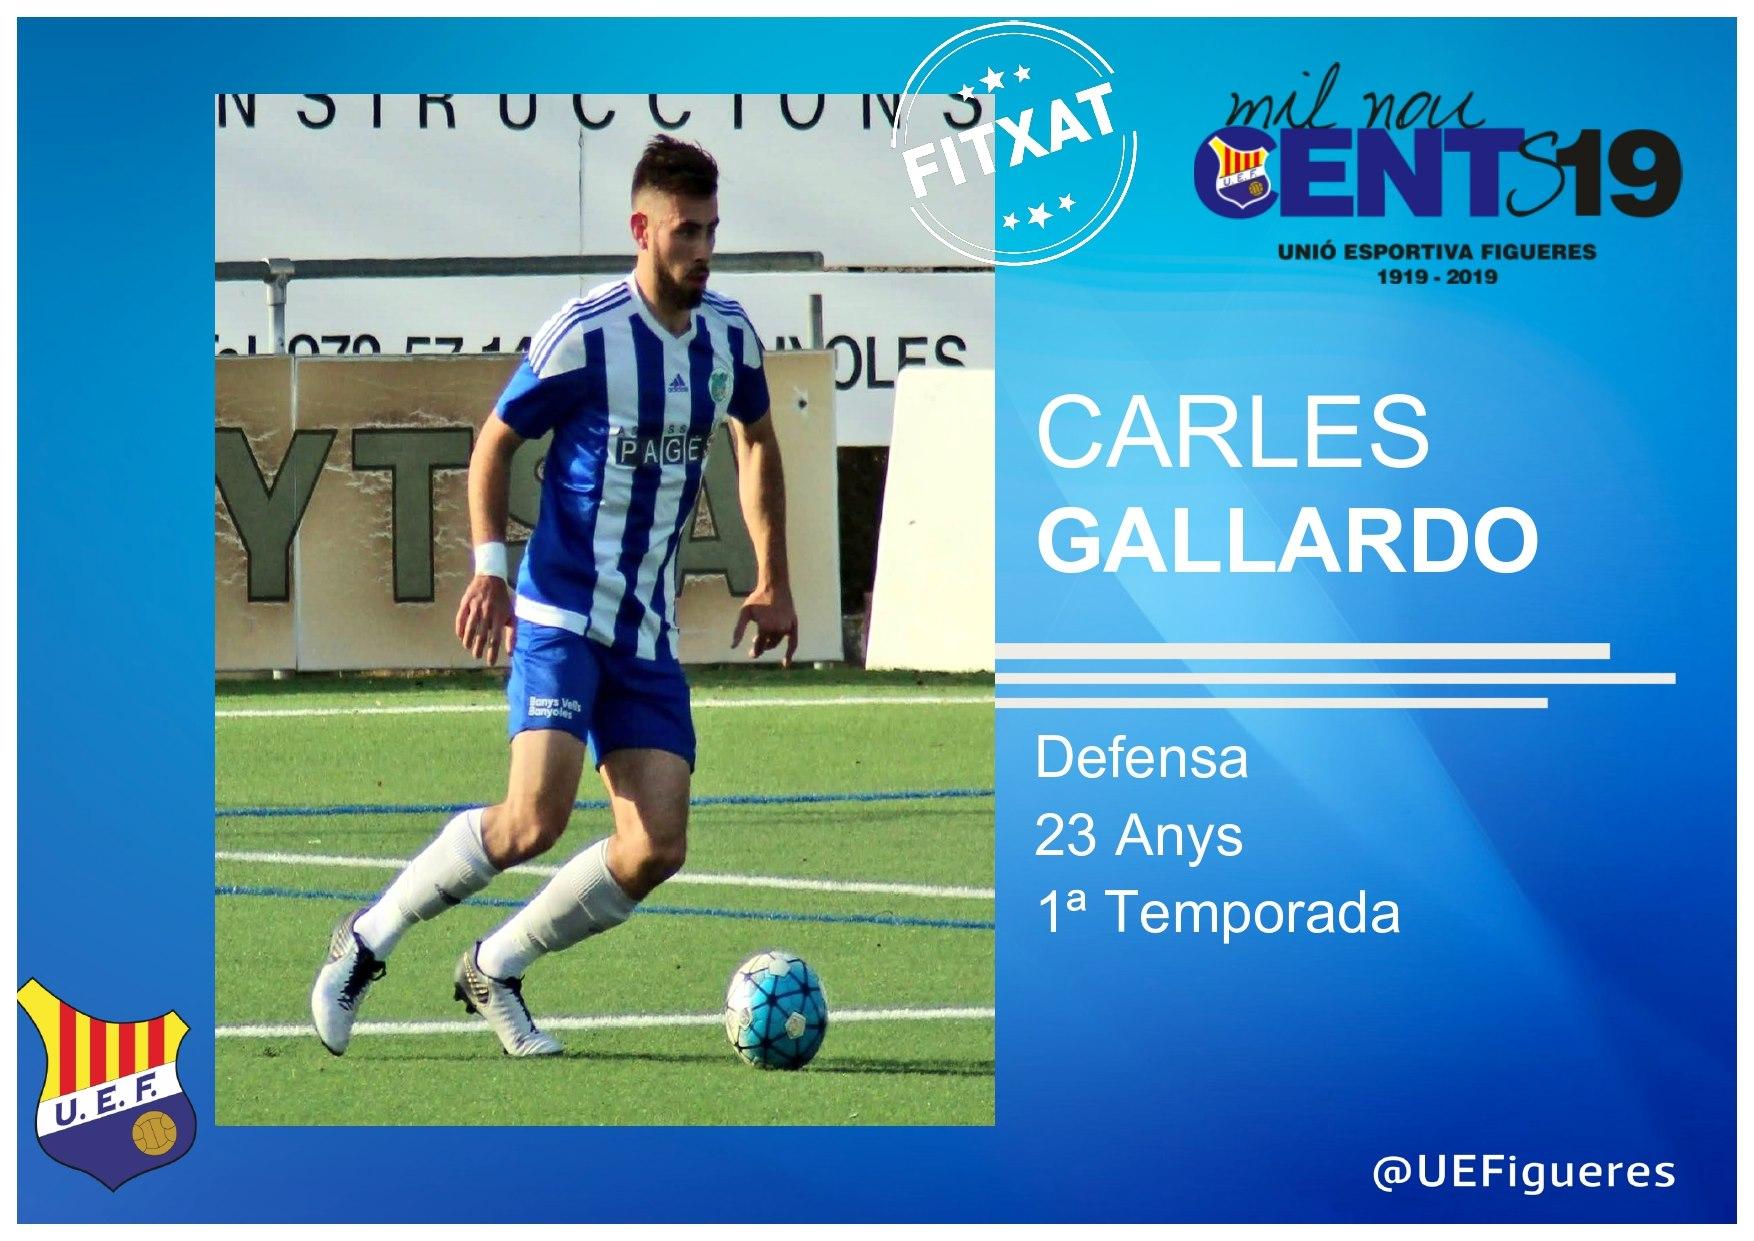 Carles Gallardo (CE Banyoles)